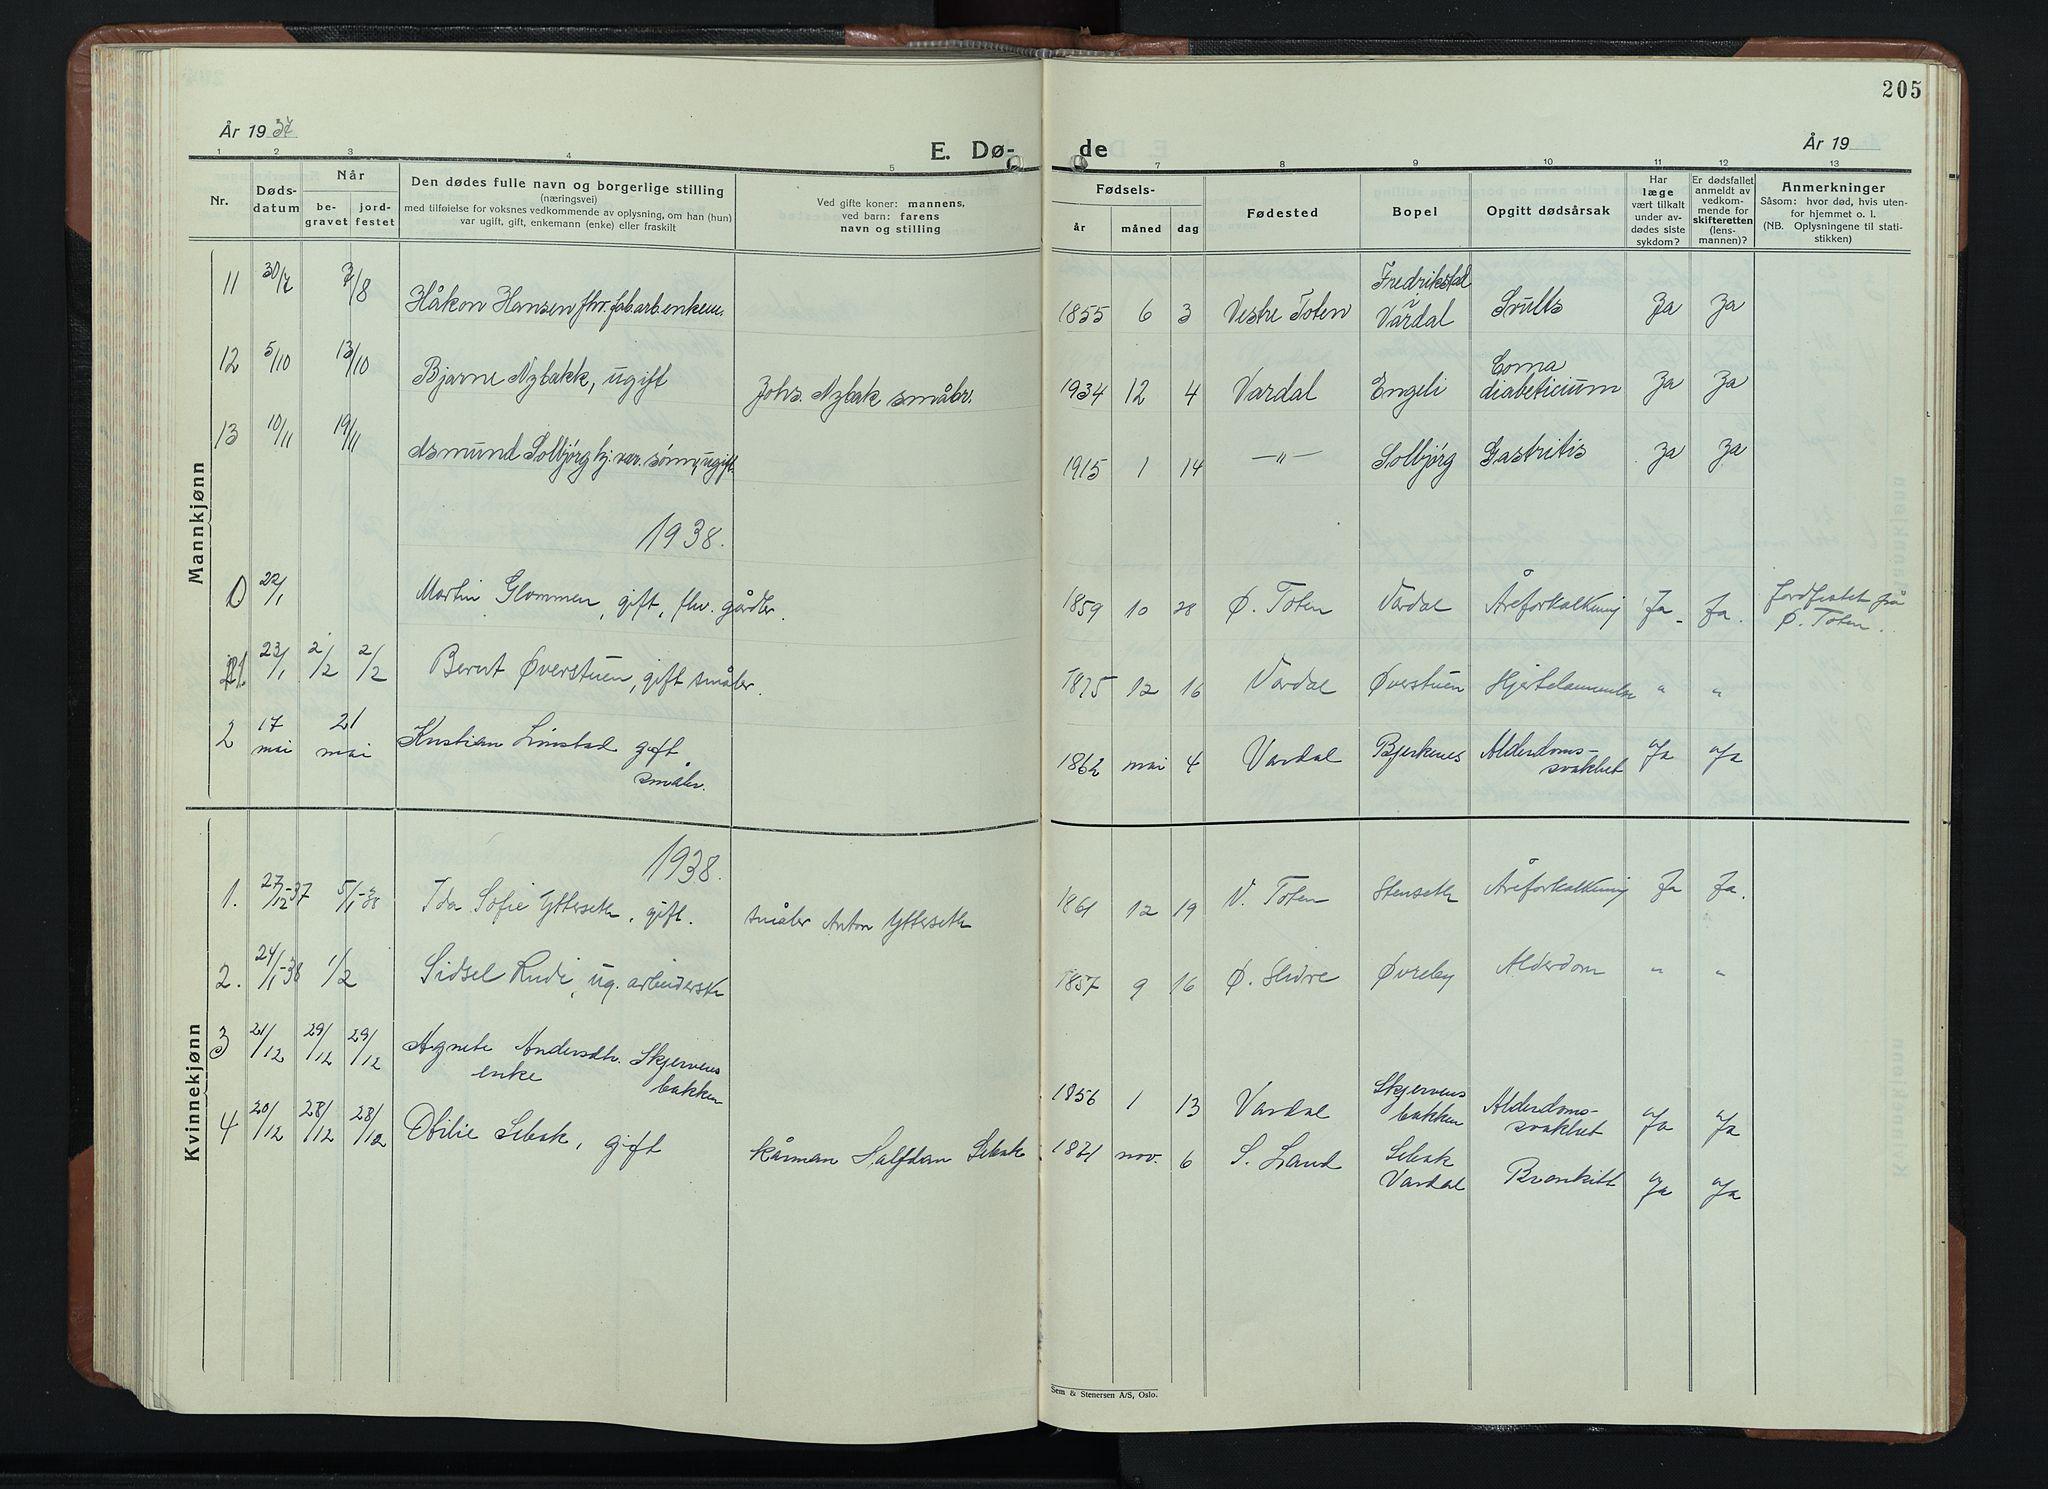 SAH, Vardal prestekontor, H/Ha/Hab/L0018: Klokkerbok nr. 18, 1931-1951, s. 205